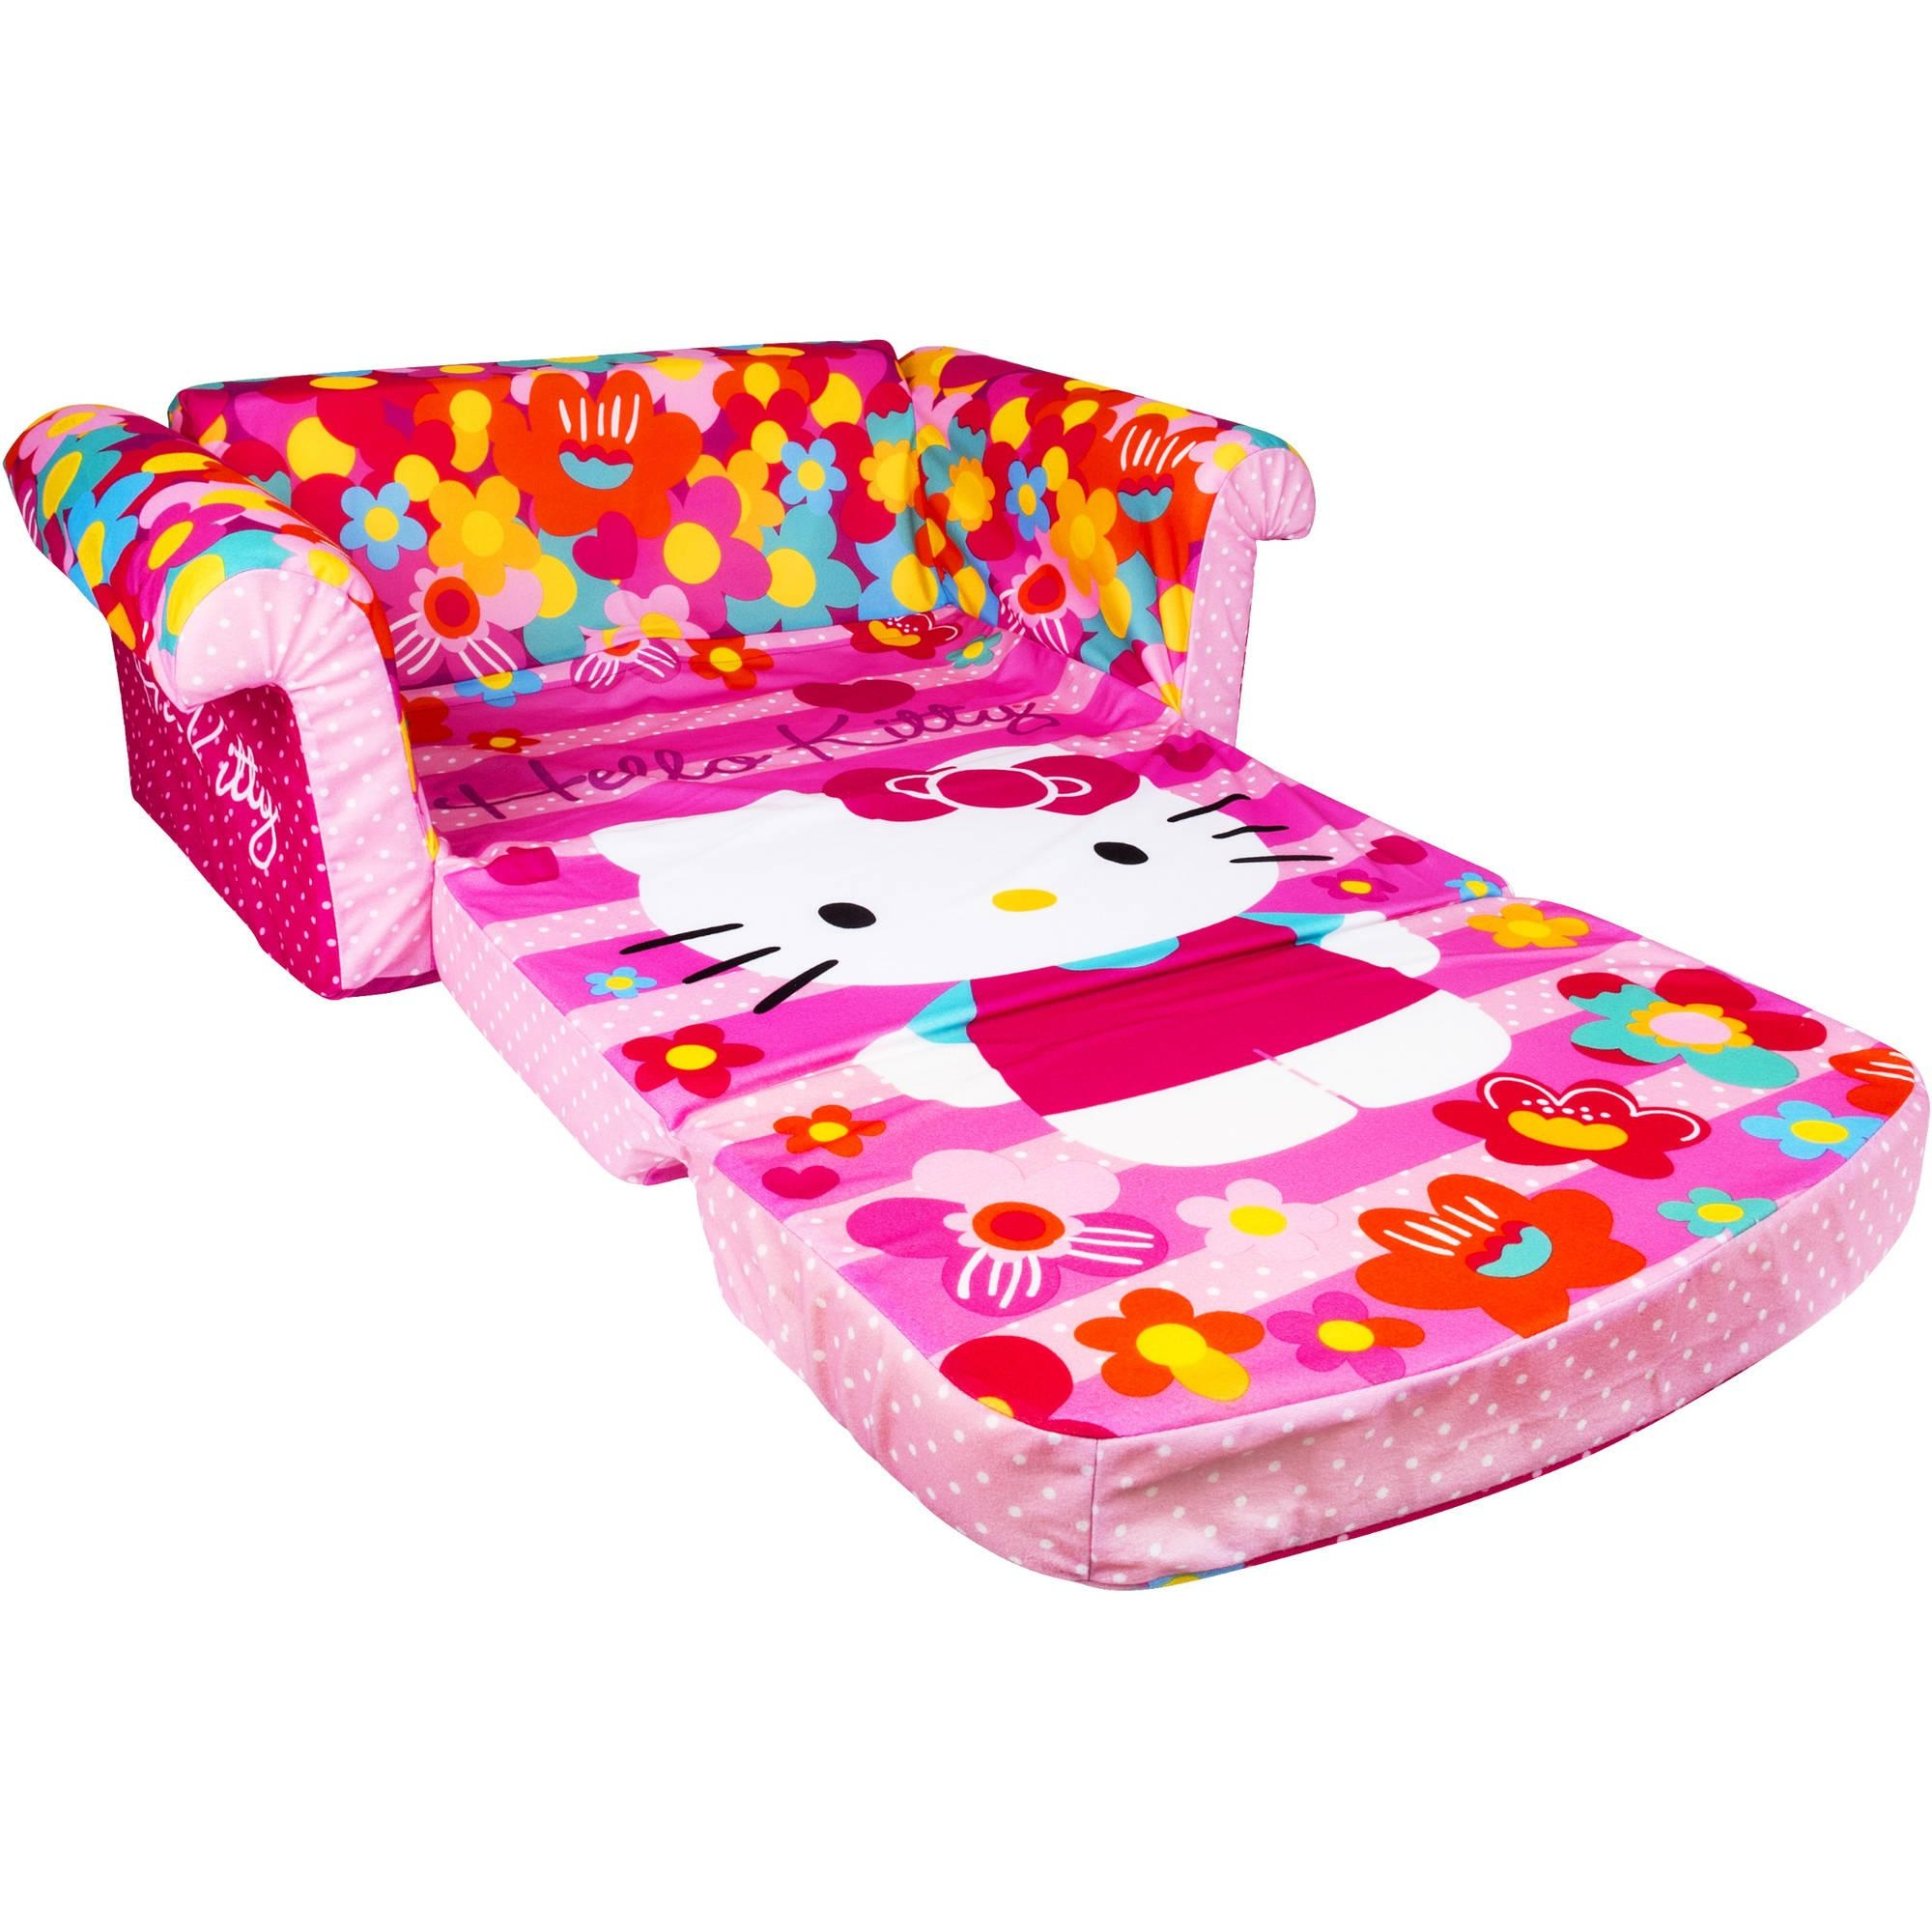 fun furniture flip open sofa disney princess pink seafoam green sofas 20 top kids ideas